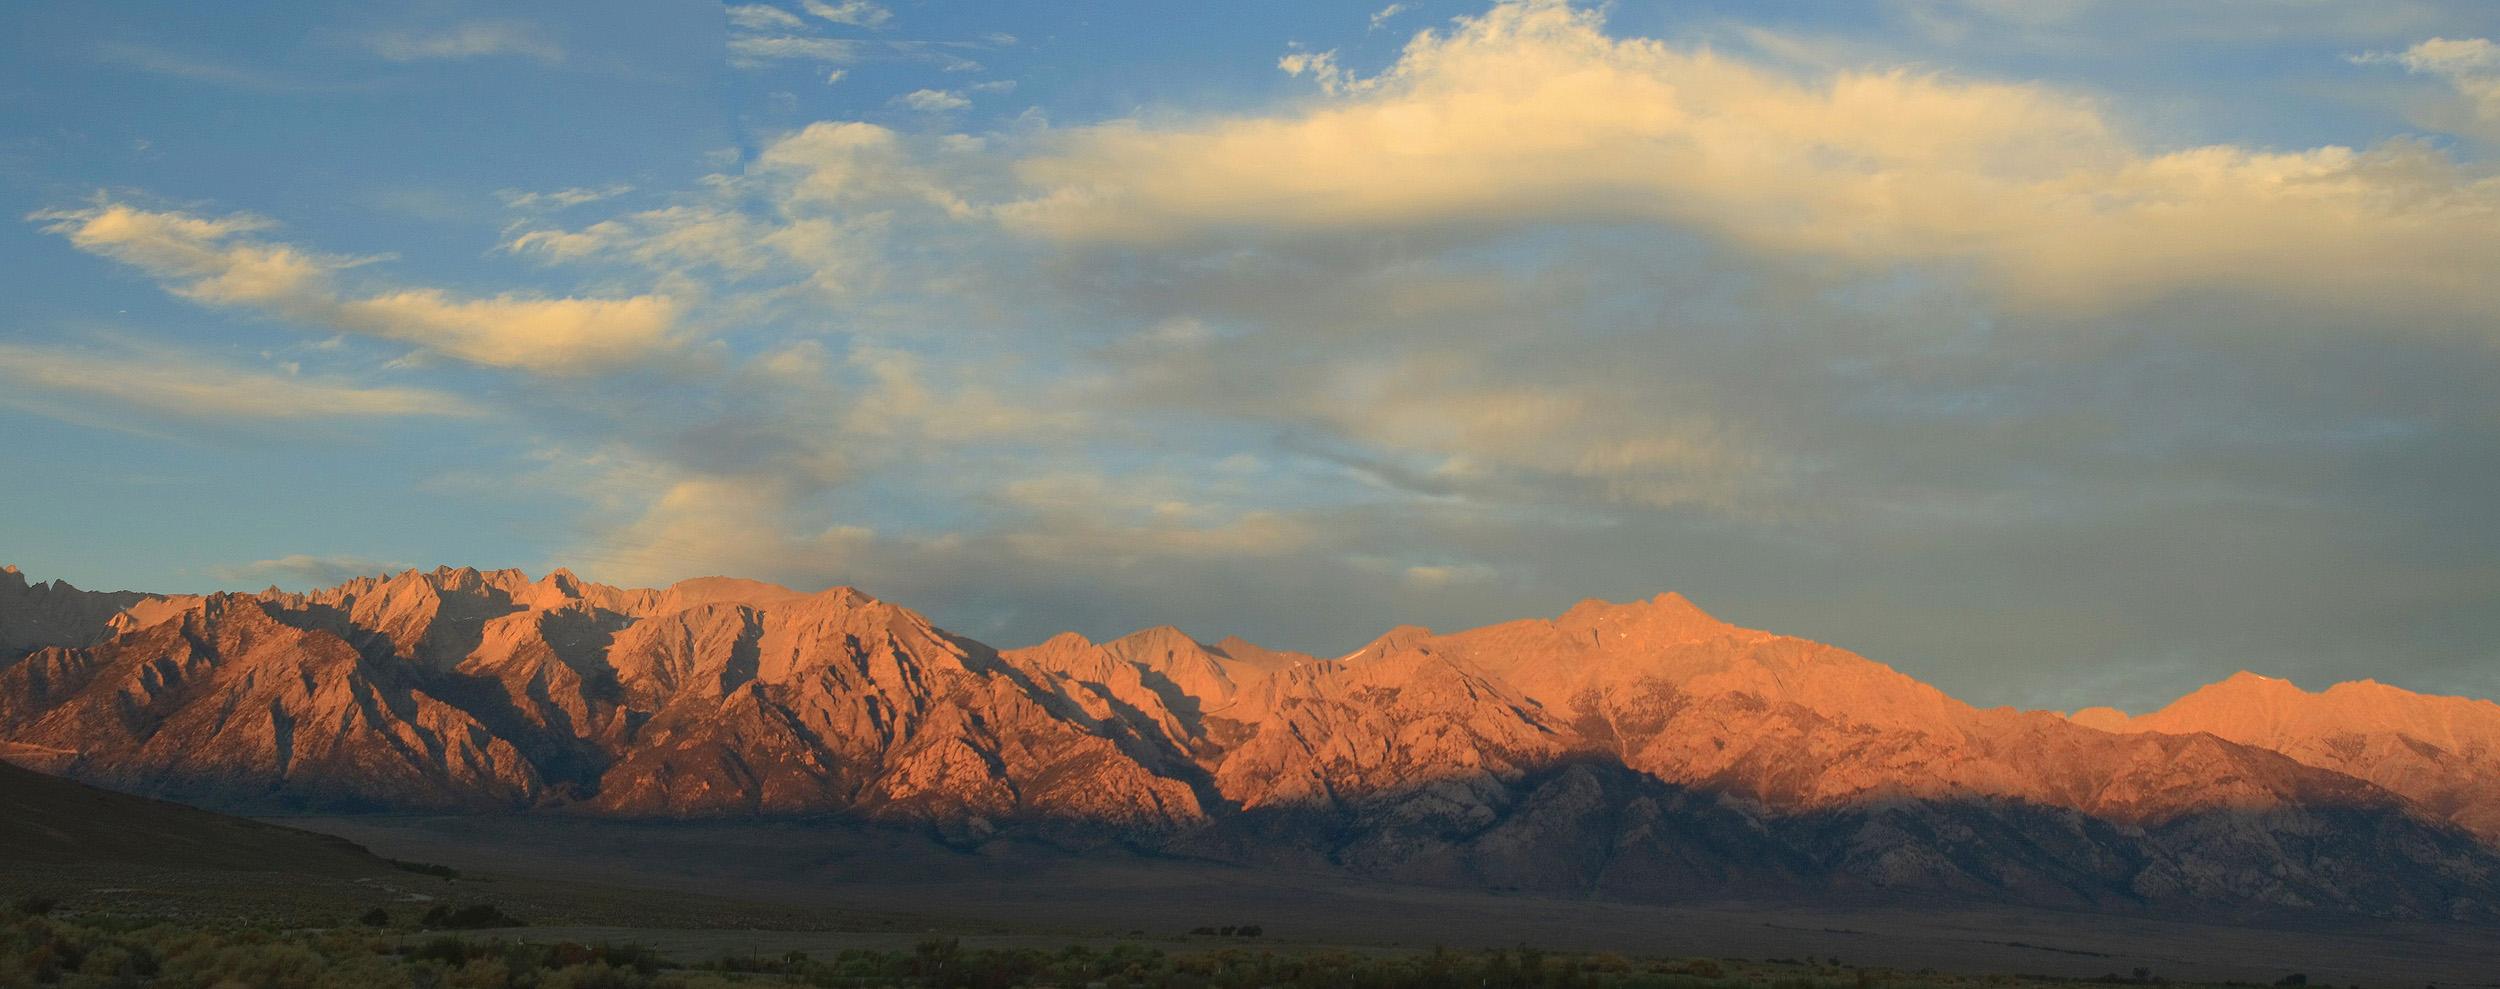 Sierra Nevada Crest in Morning Sunlight